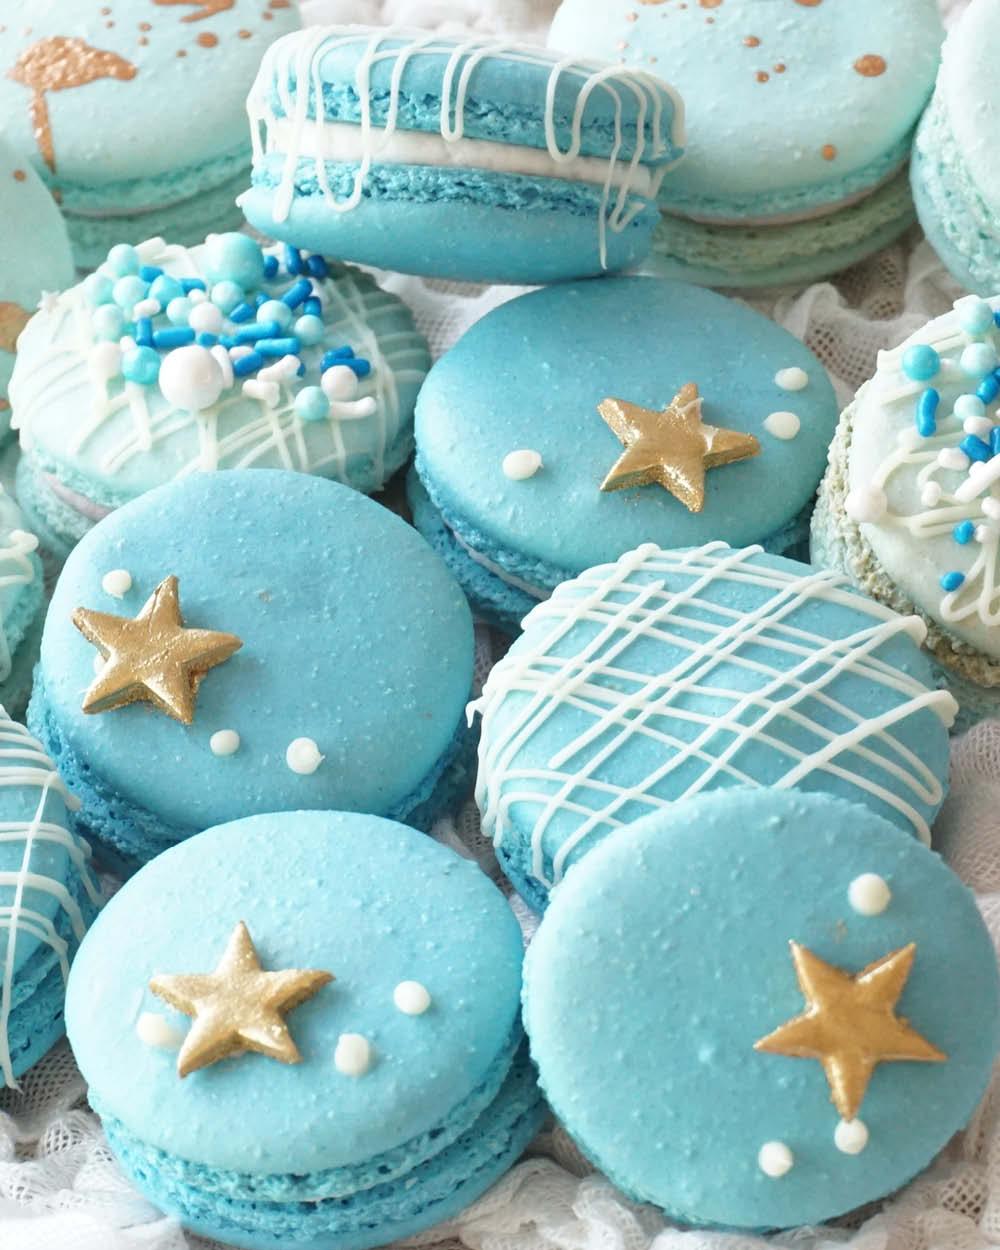 Cakes_By_Aranee_Perth_Drip_Cakes_Custom_Cakes_Wedding_Cakes_Macarons_Cupcakes_Personalised_Cookies_OTHER_DESSERTS_Gallery9.jpg